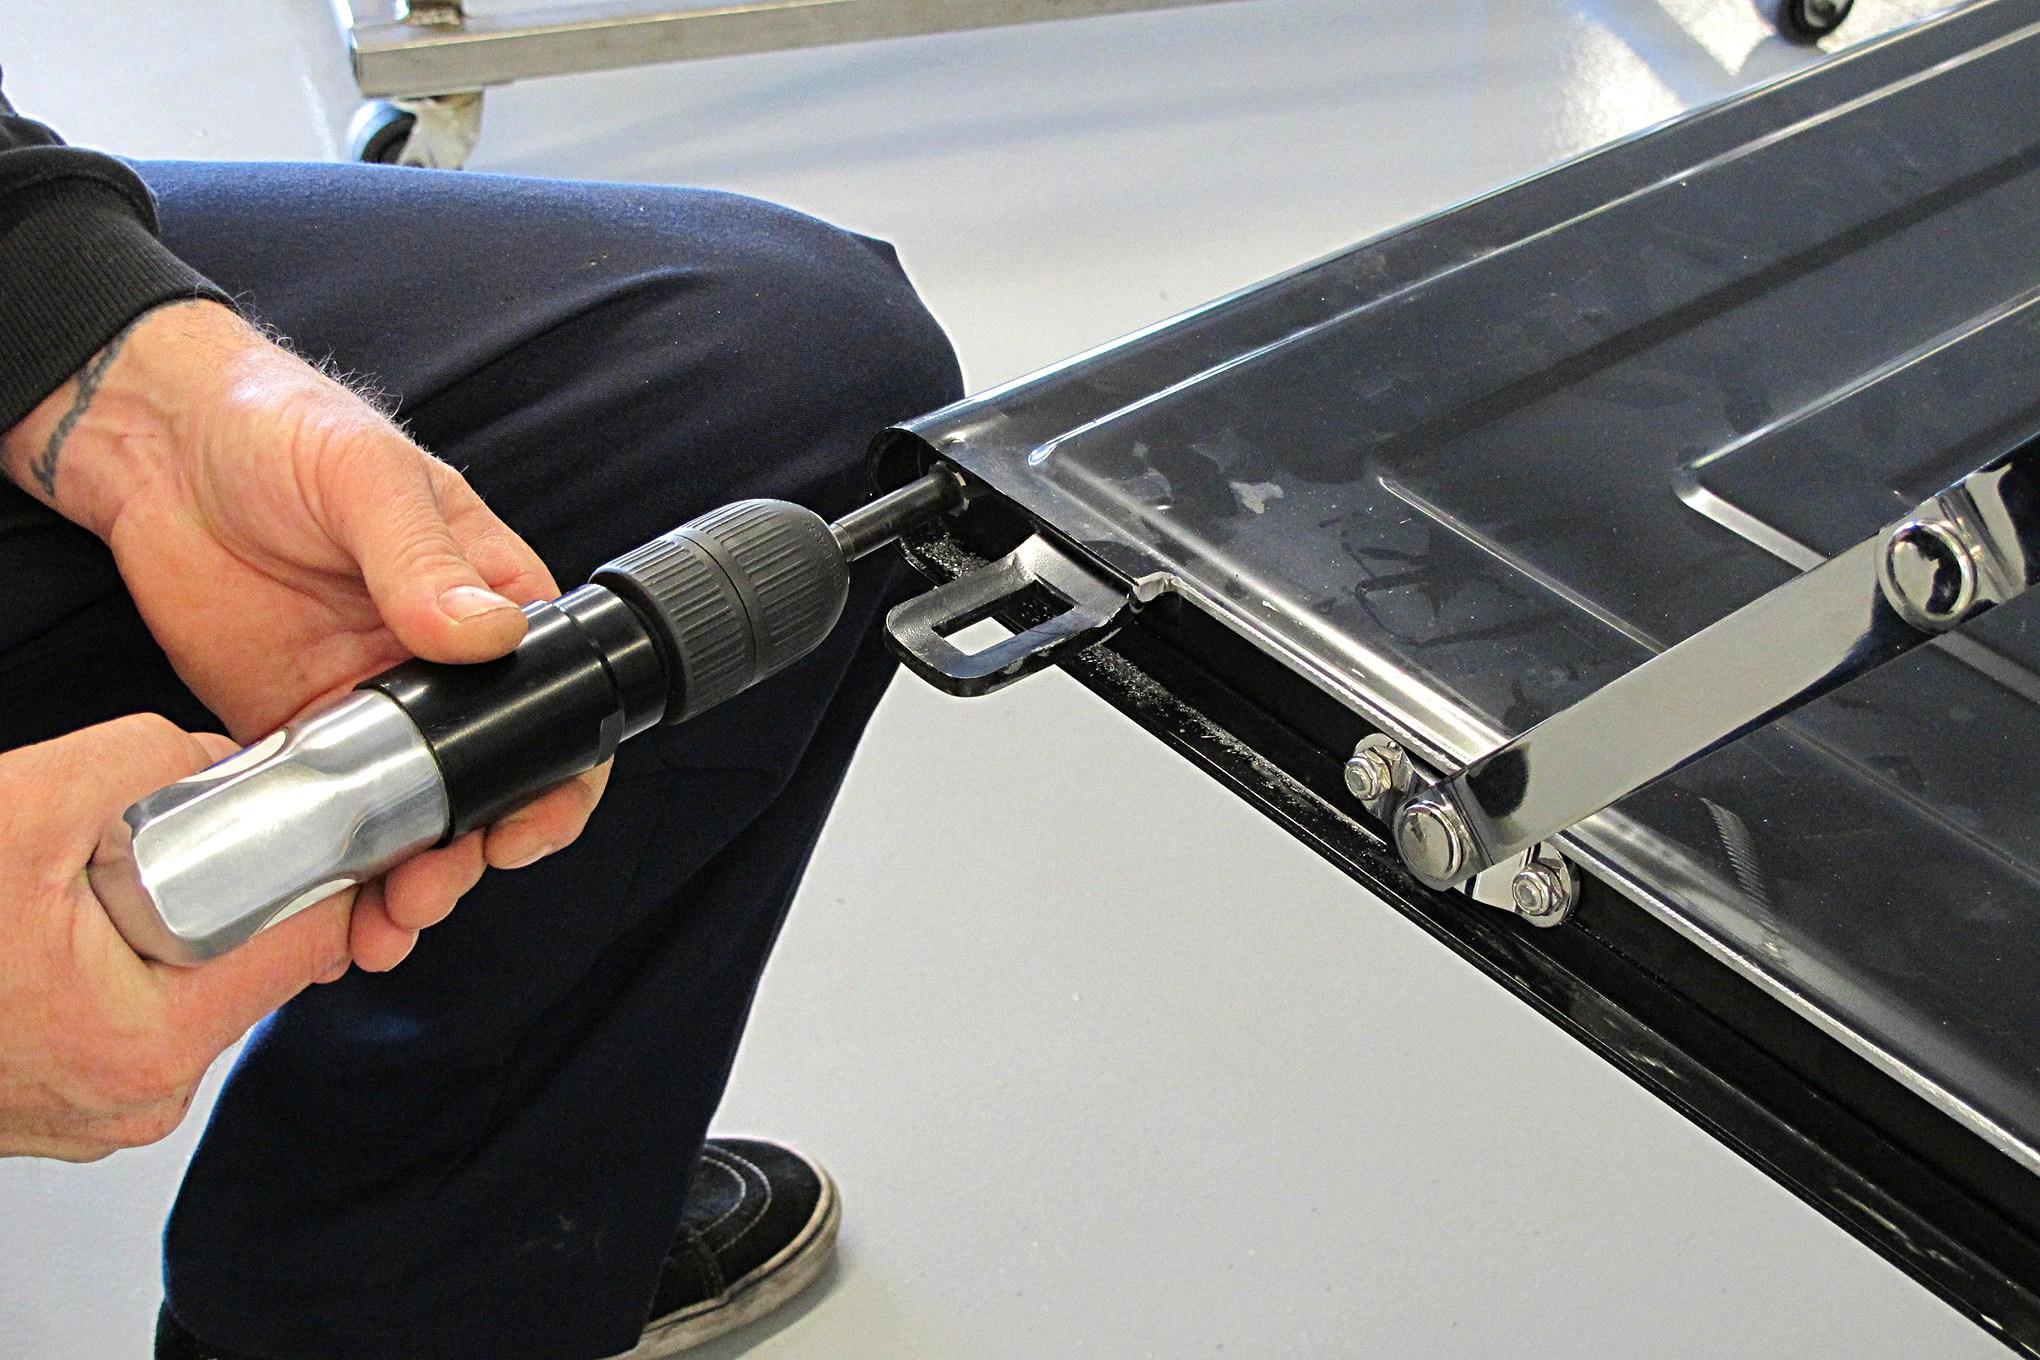 15-CLTP-170100-chevy-stepside-hidden-tailgate-latch-install.JPG